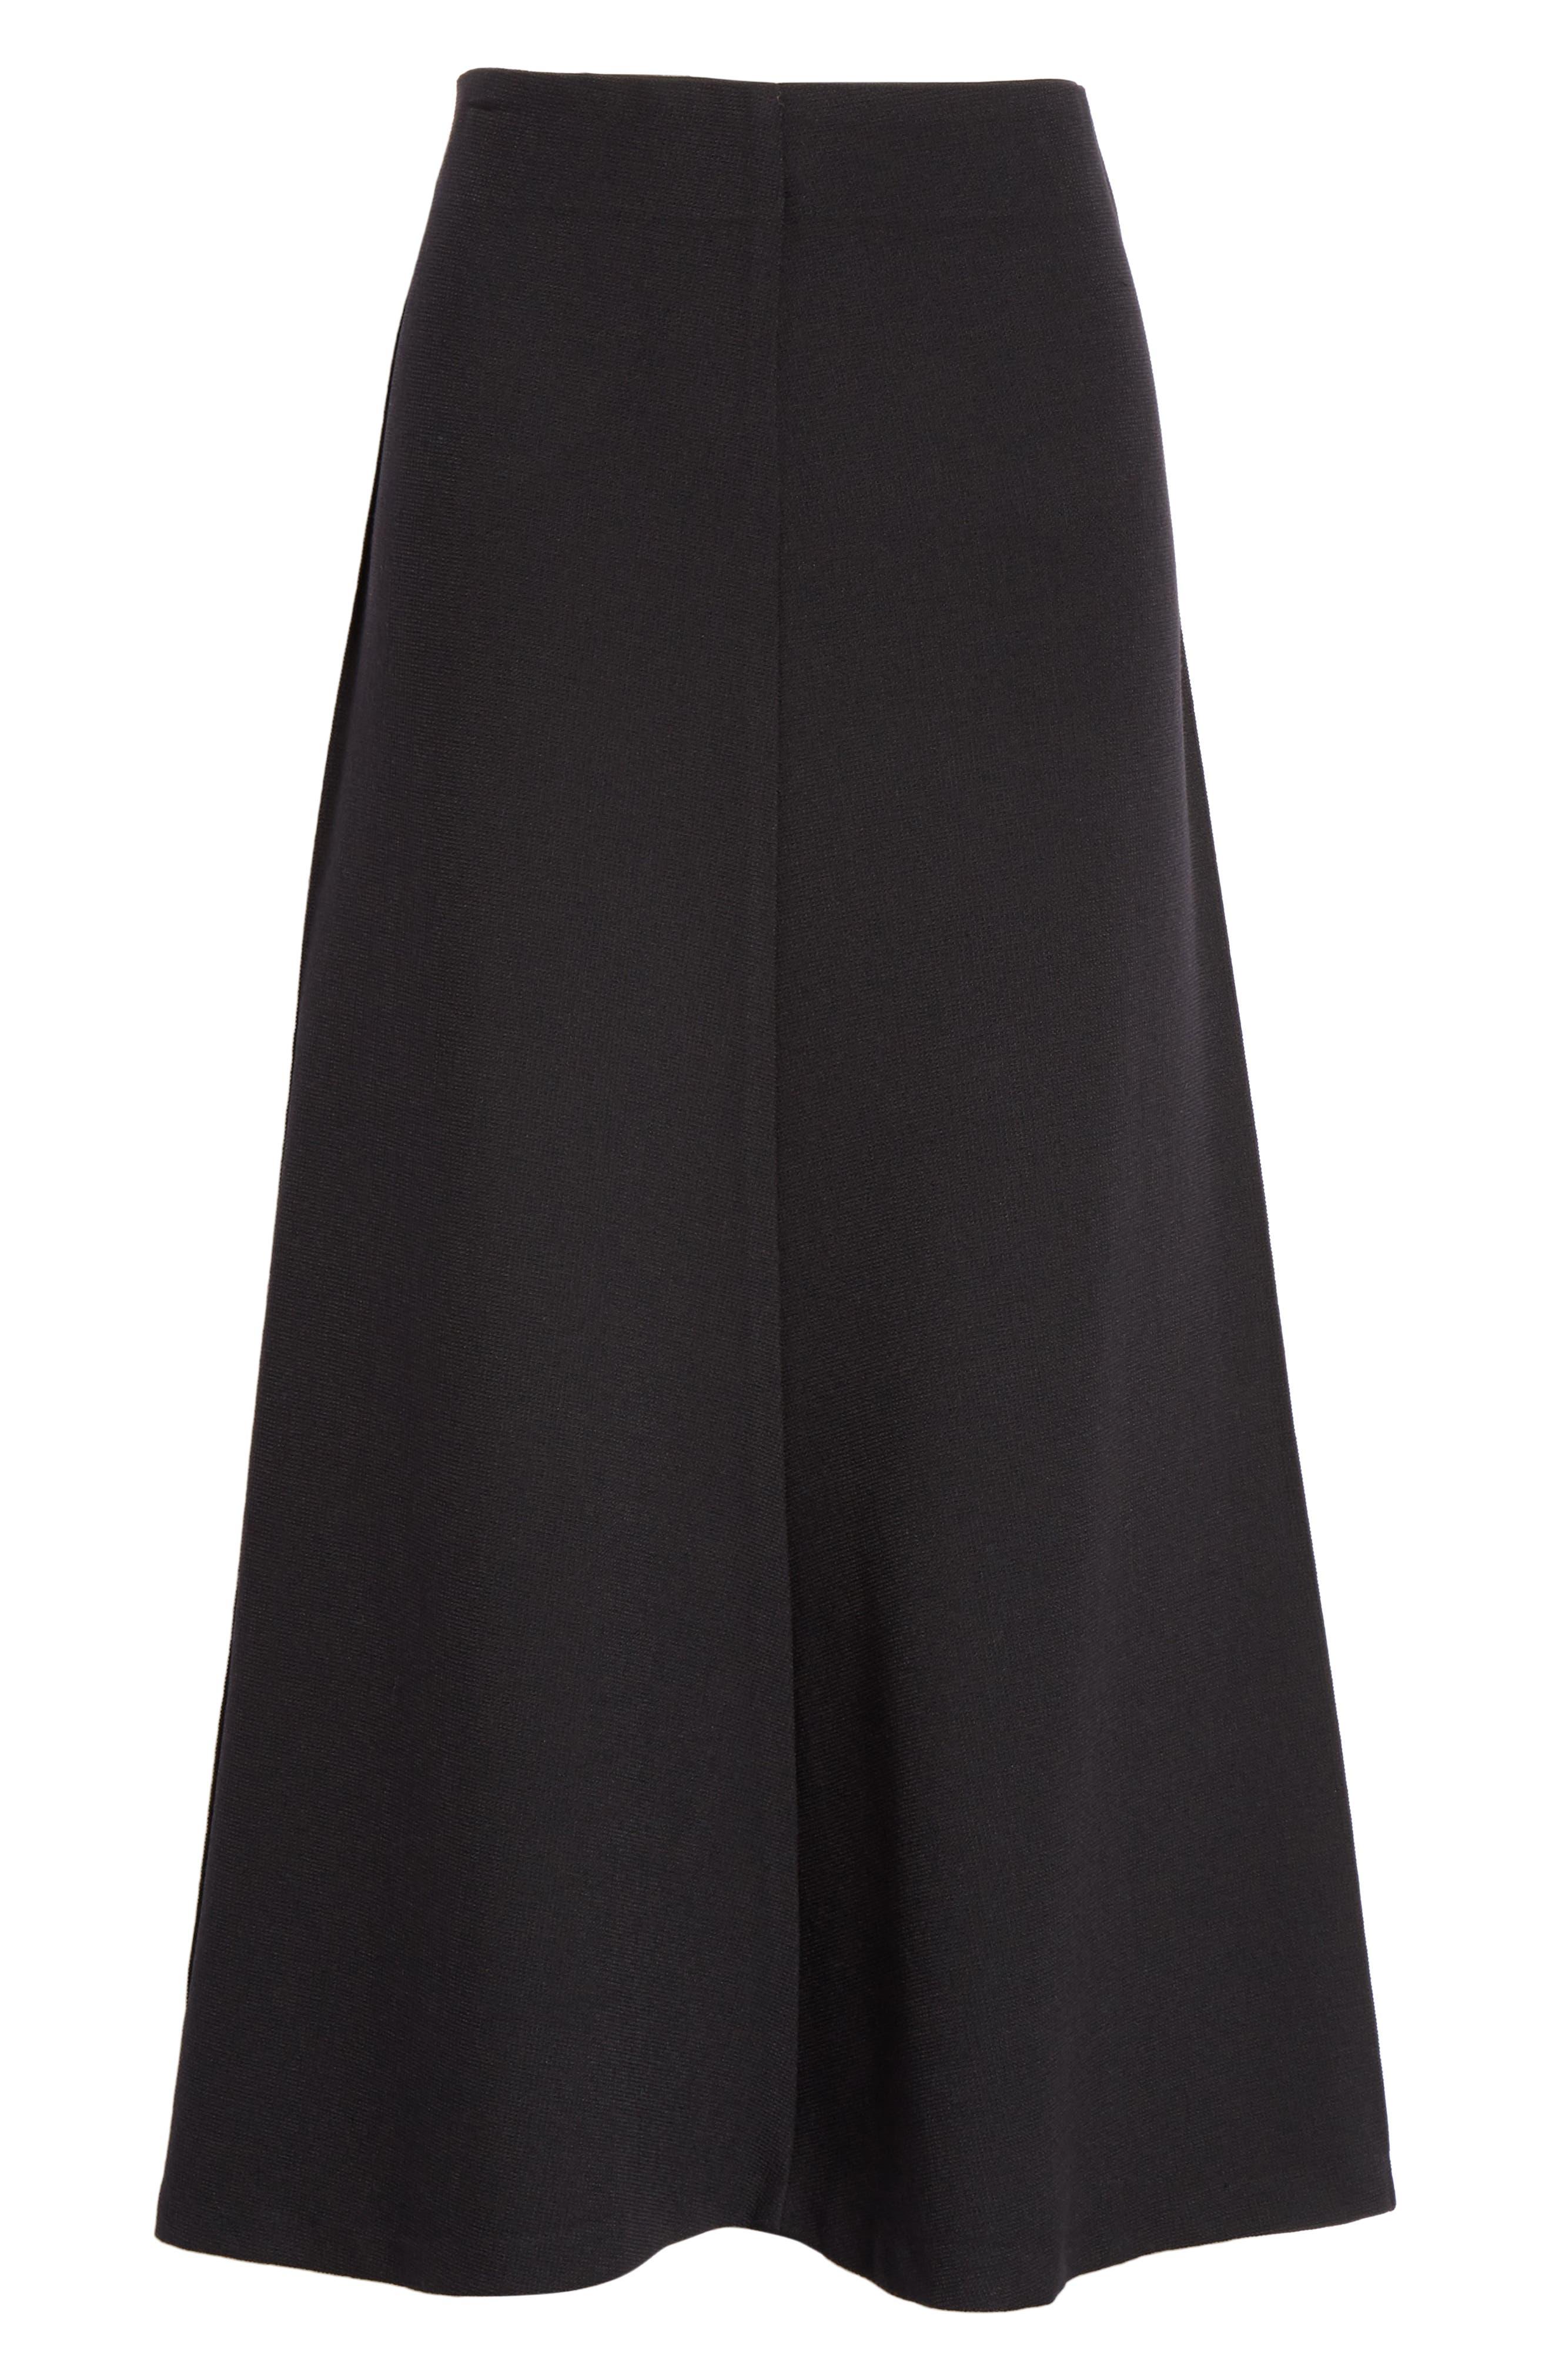 Fit & Flare Midi Skirt,                             Alternate thumbnail 6, color,                             BLACK PIQUE